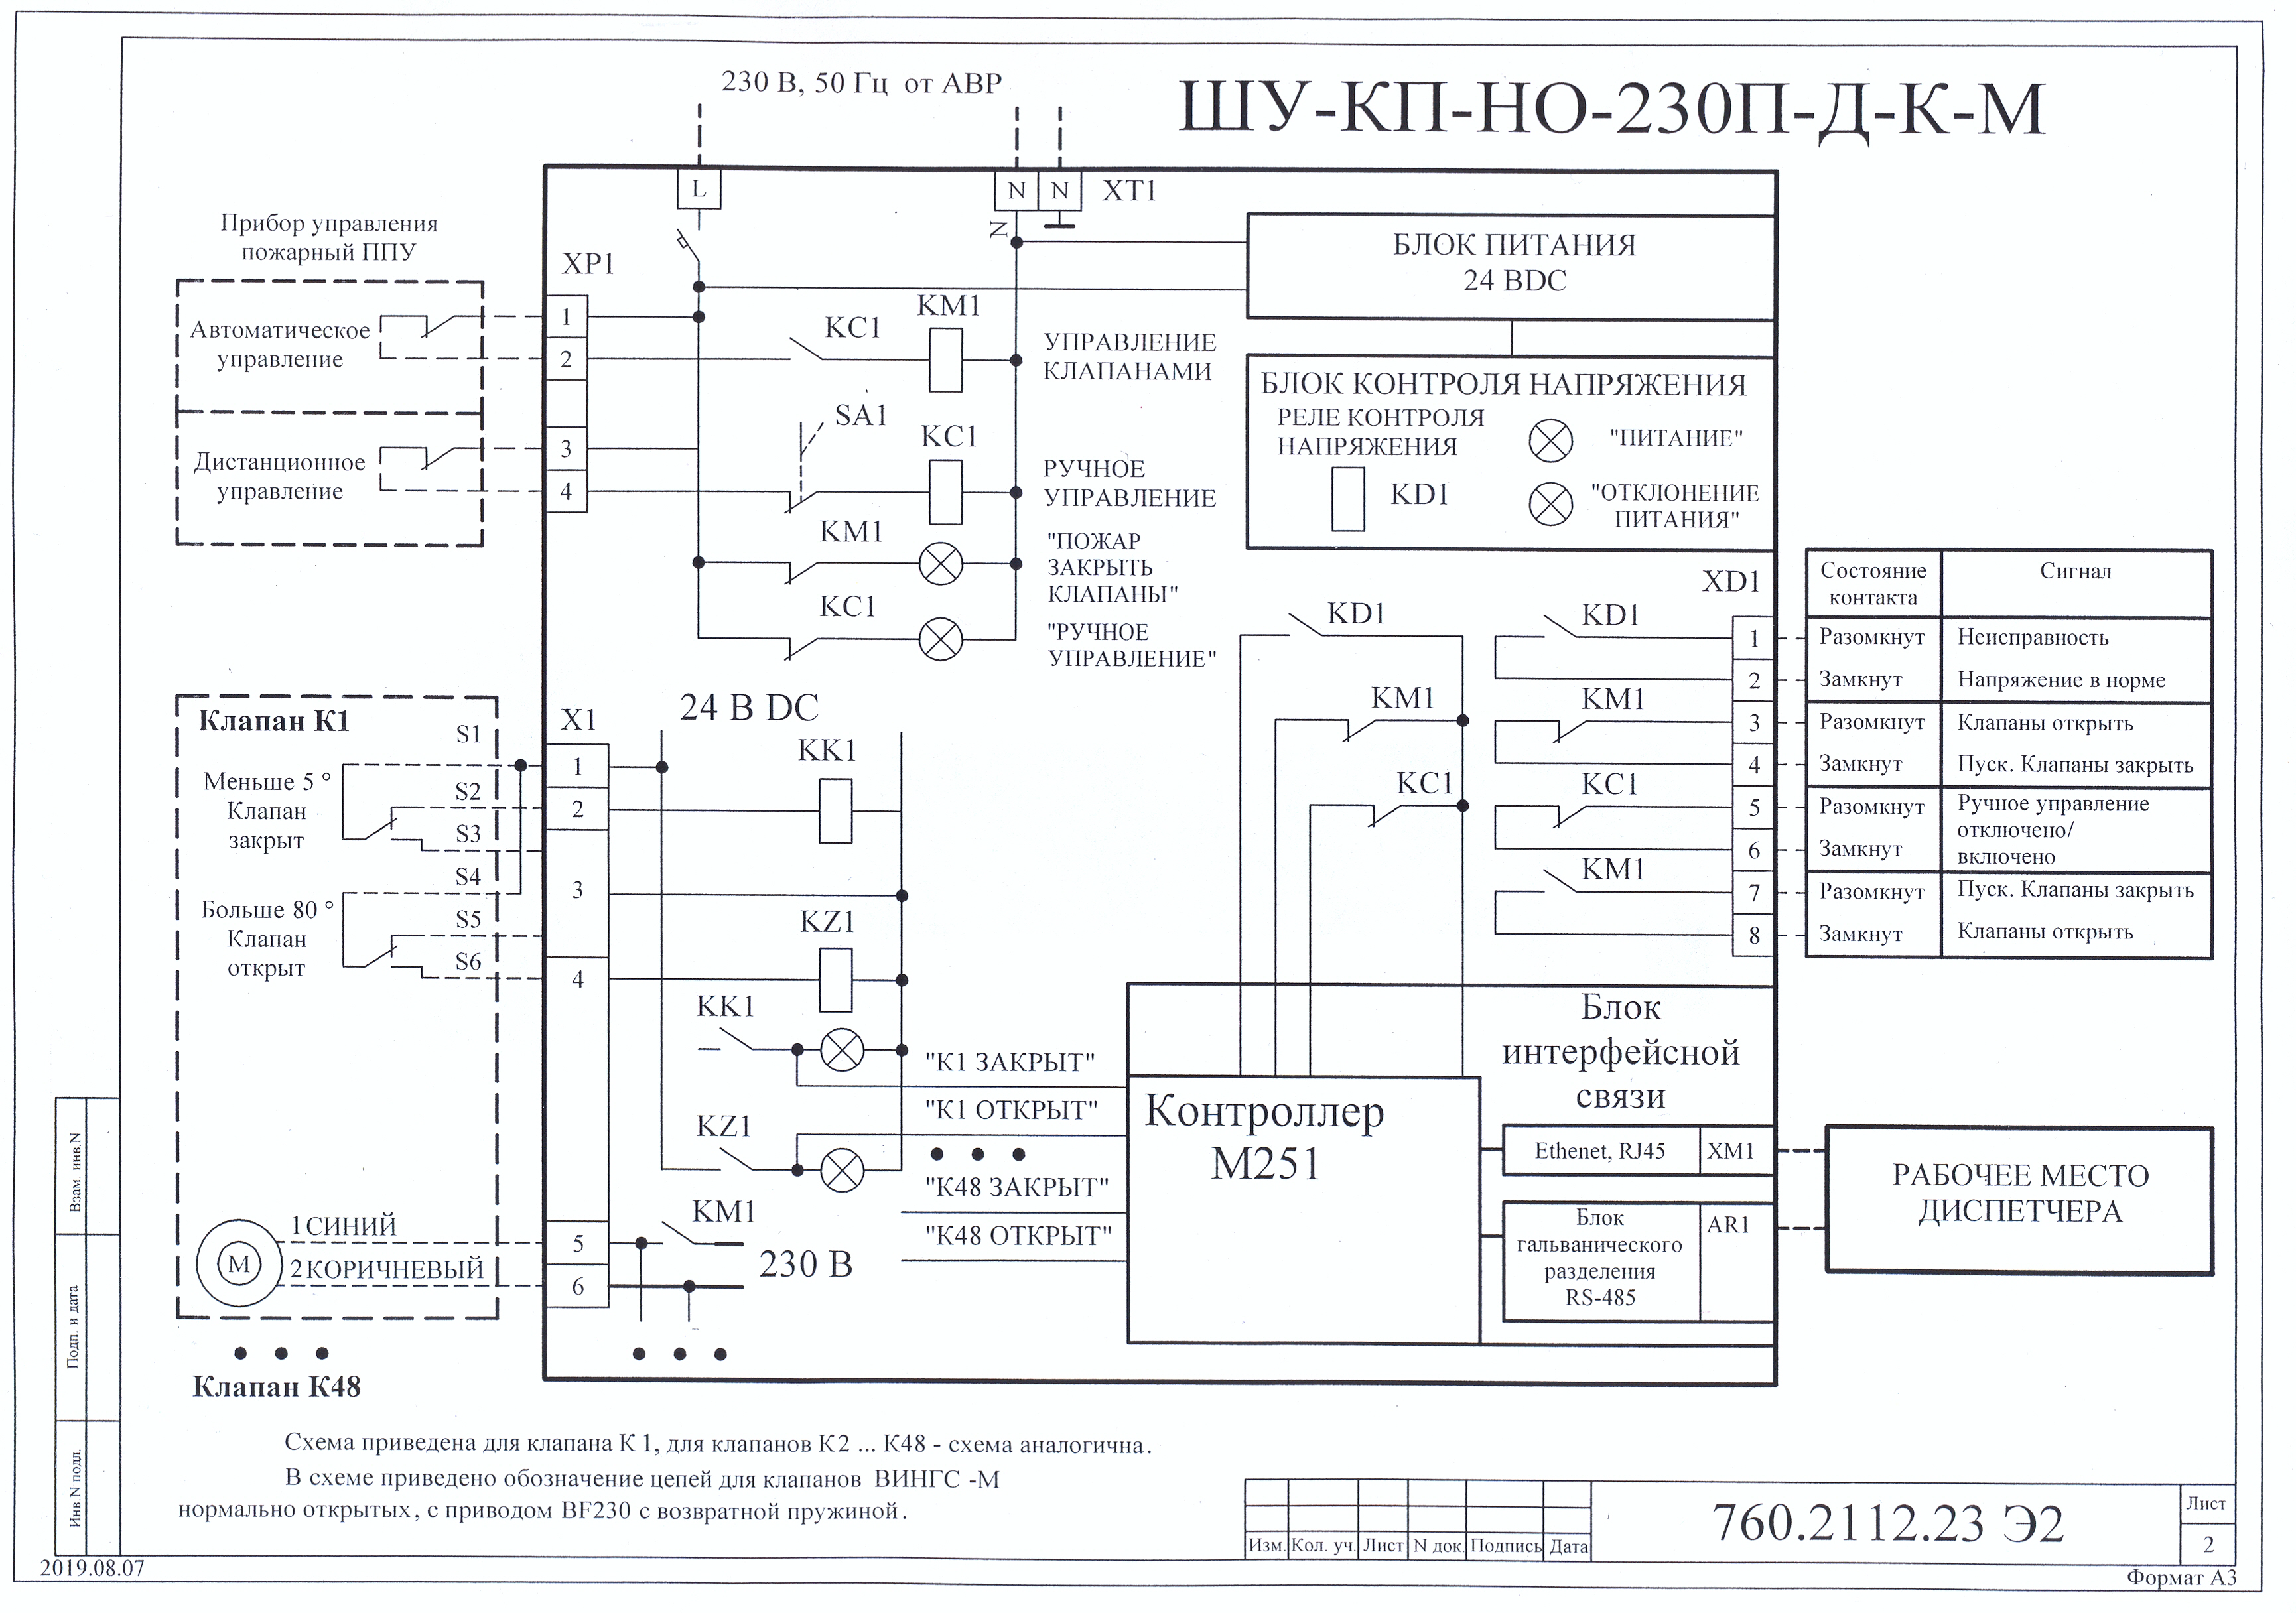 структура ШУ-КП-НО